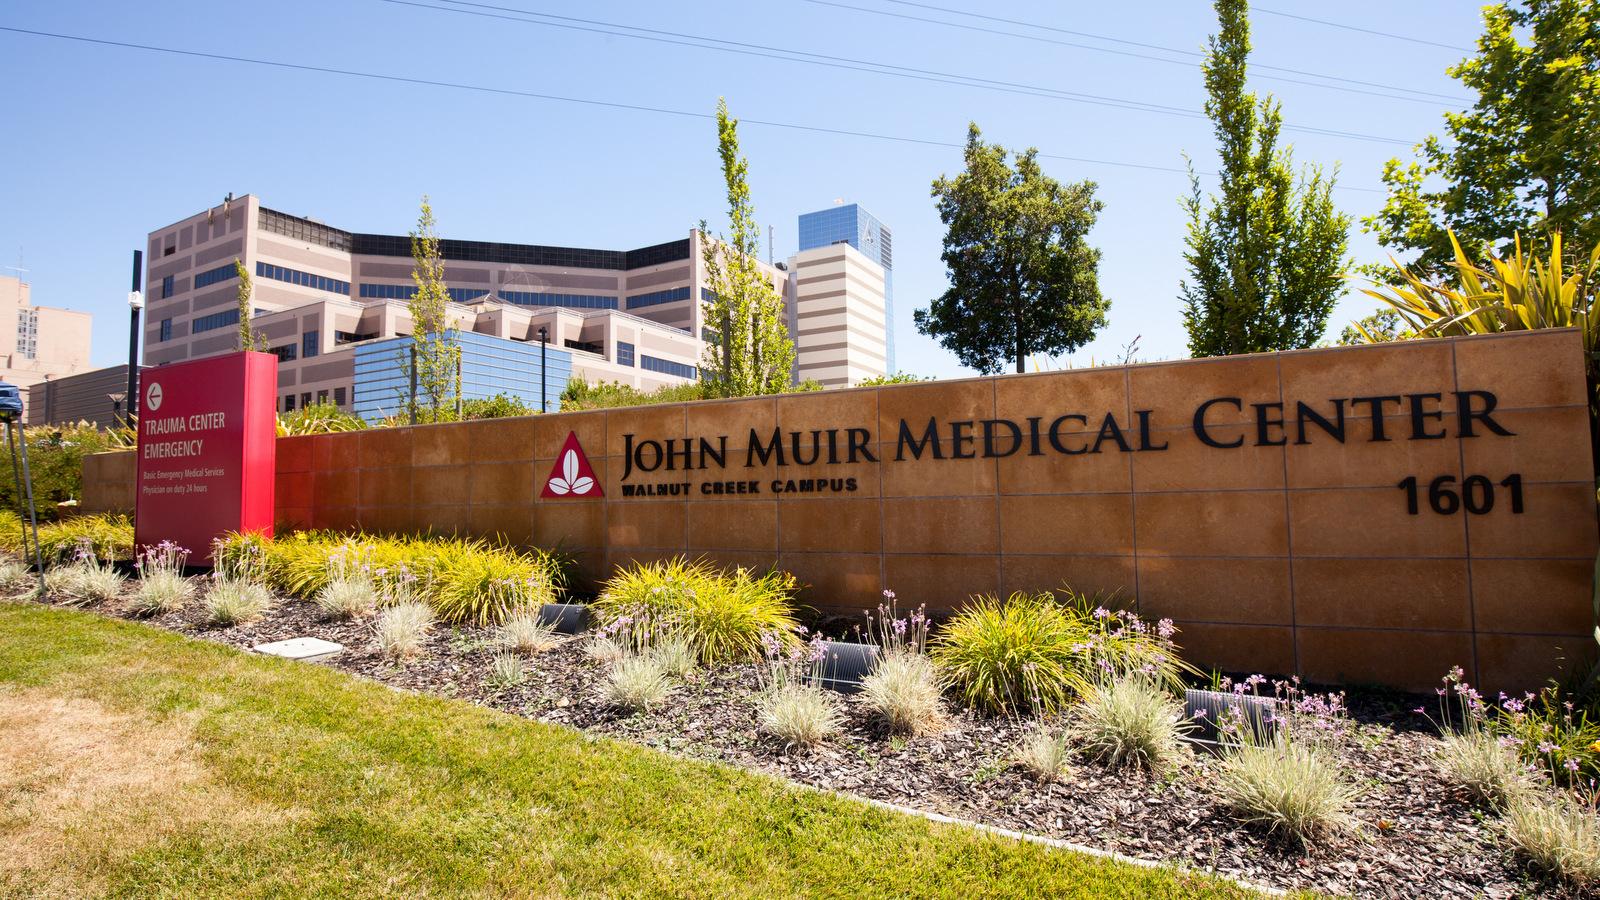 John Muir Medical Center Emergency Room Walnut Creek